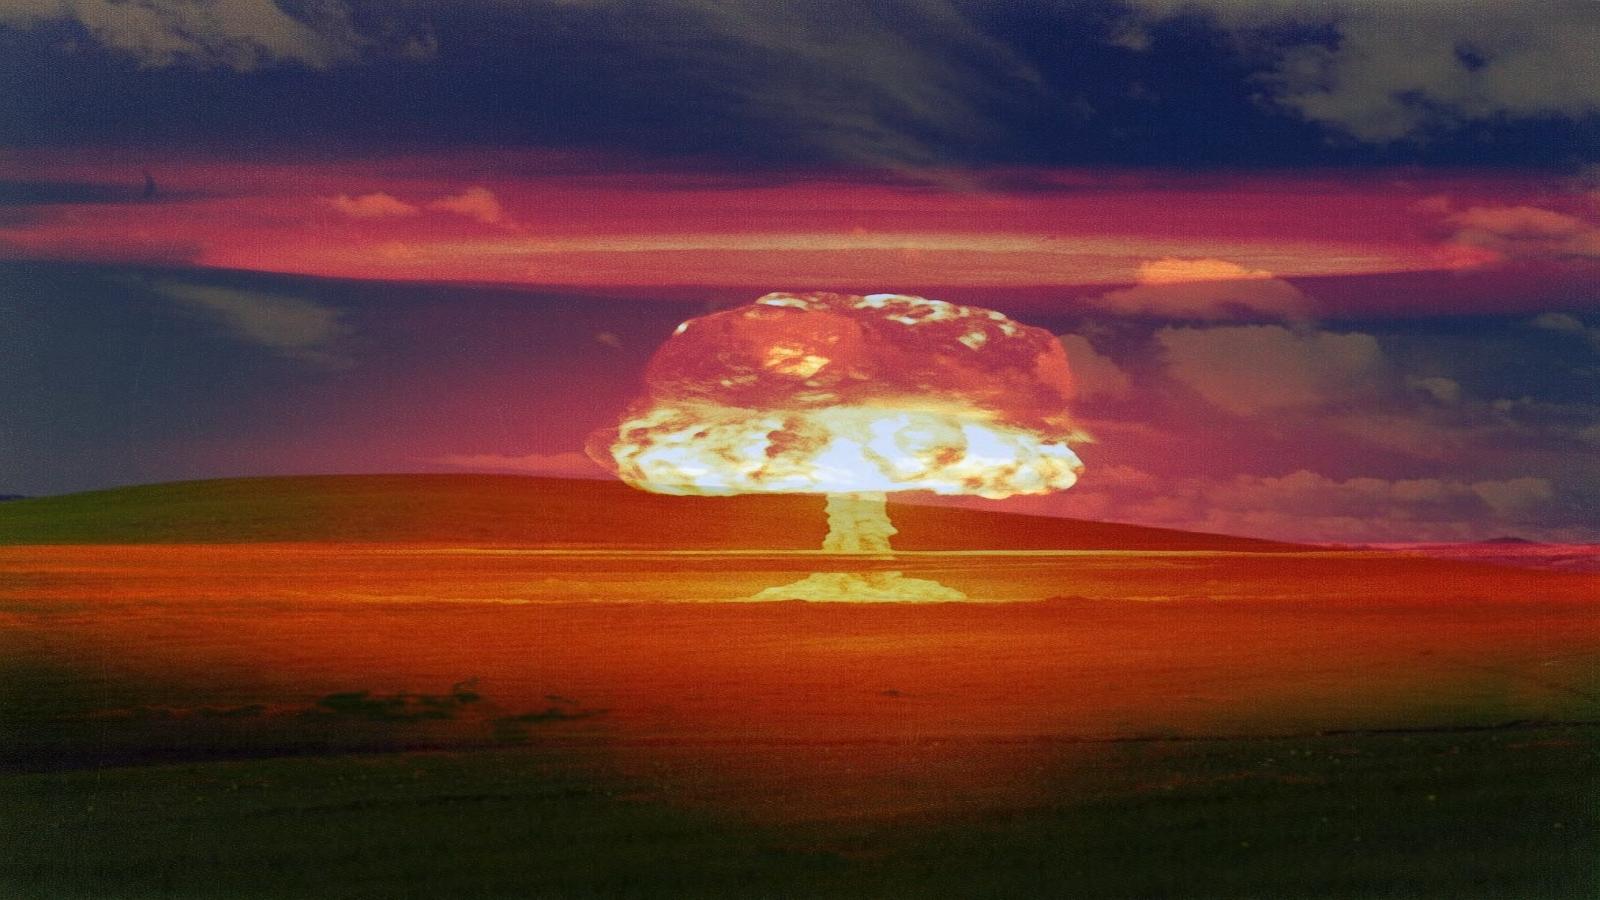 THE ARMAGEDDON GENERATION   The Word – Ray Joseph Cormier